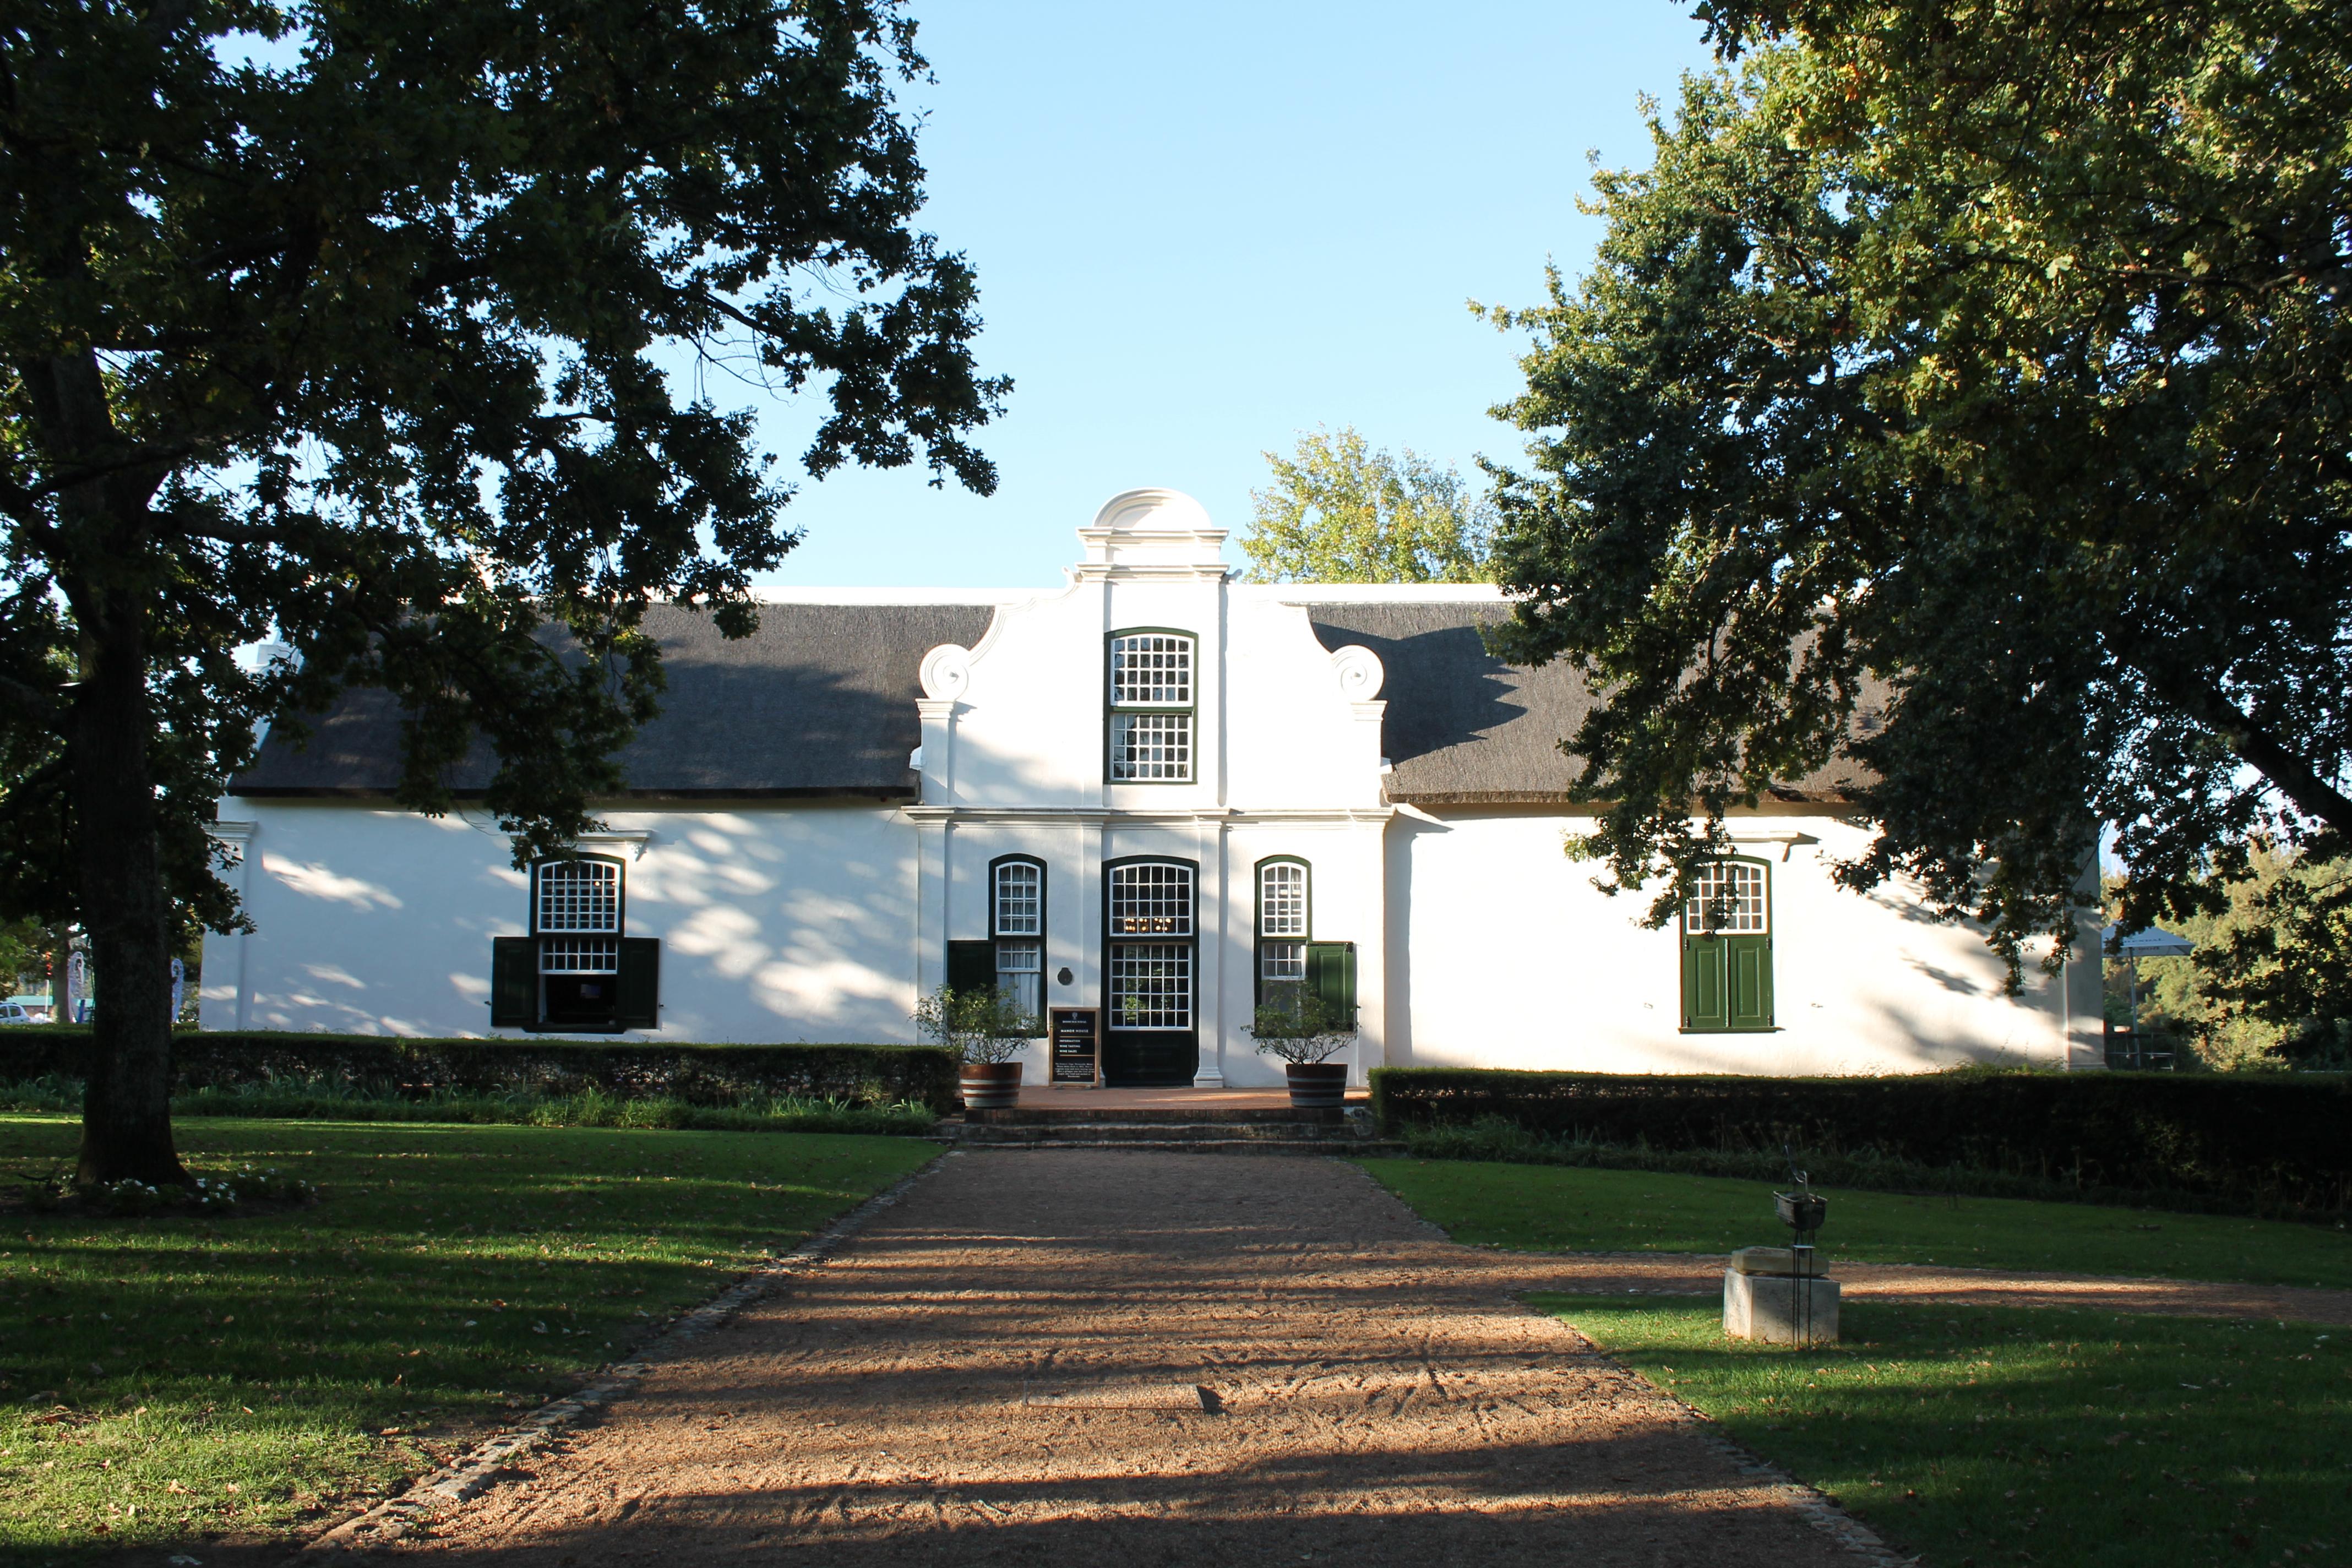 boschendal-manor-house-lustforthesublime